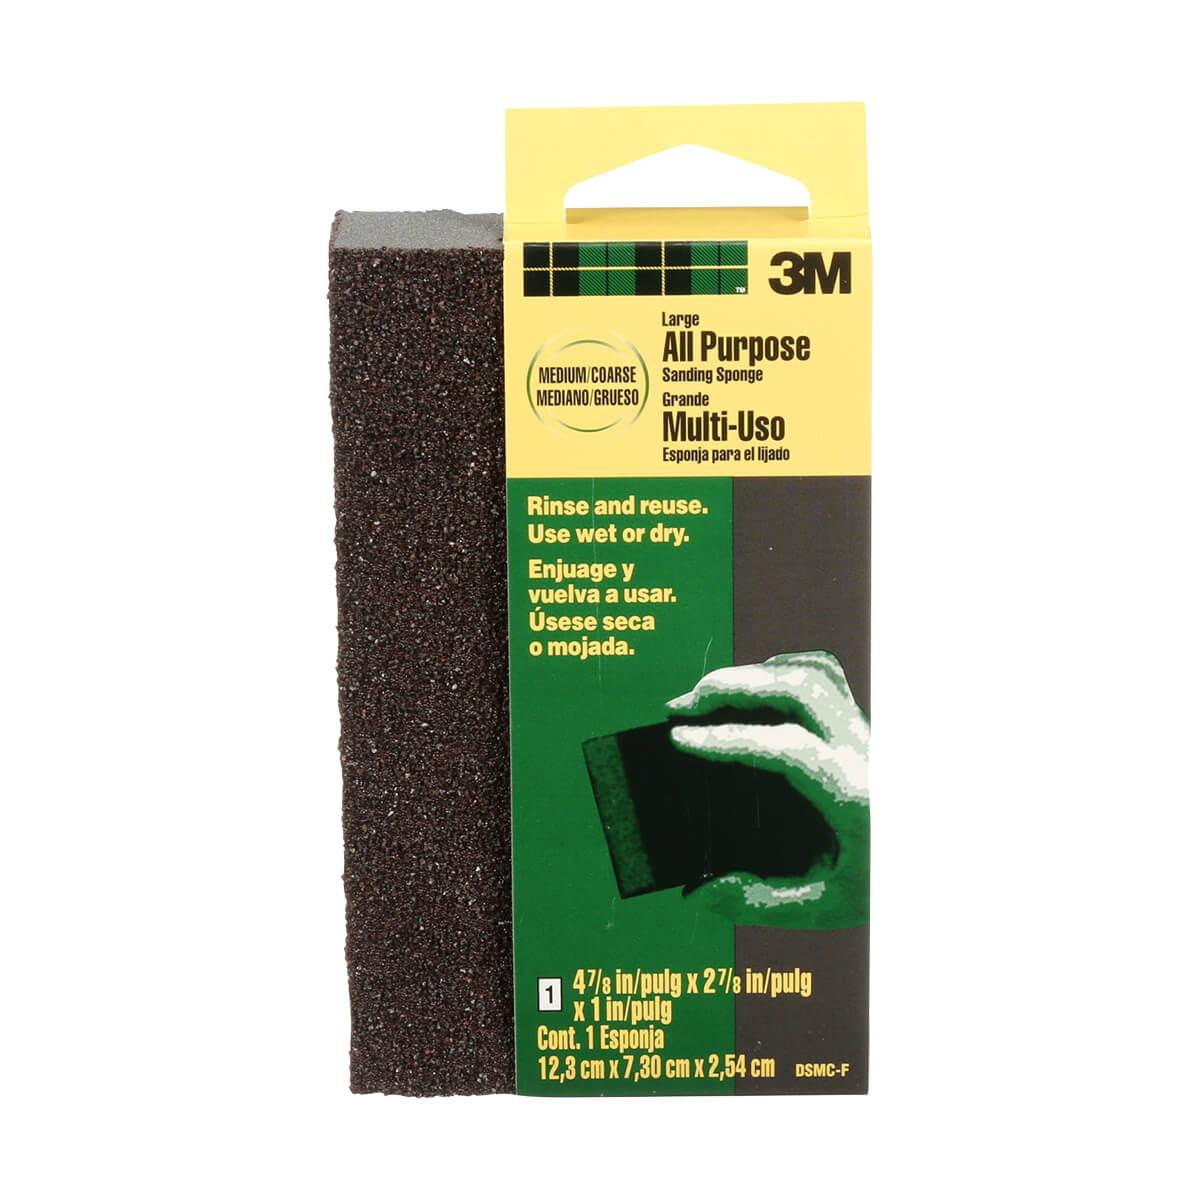 3M Large Area Sanding Sponge - Medium/Coarse Grit